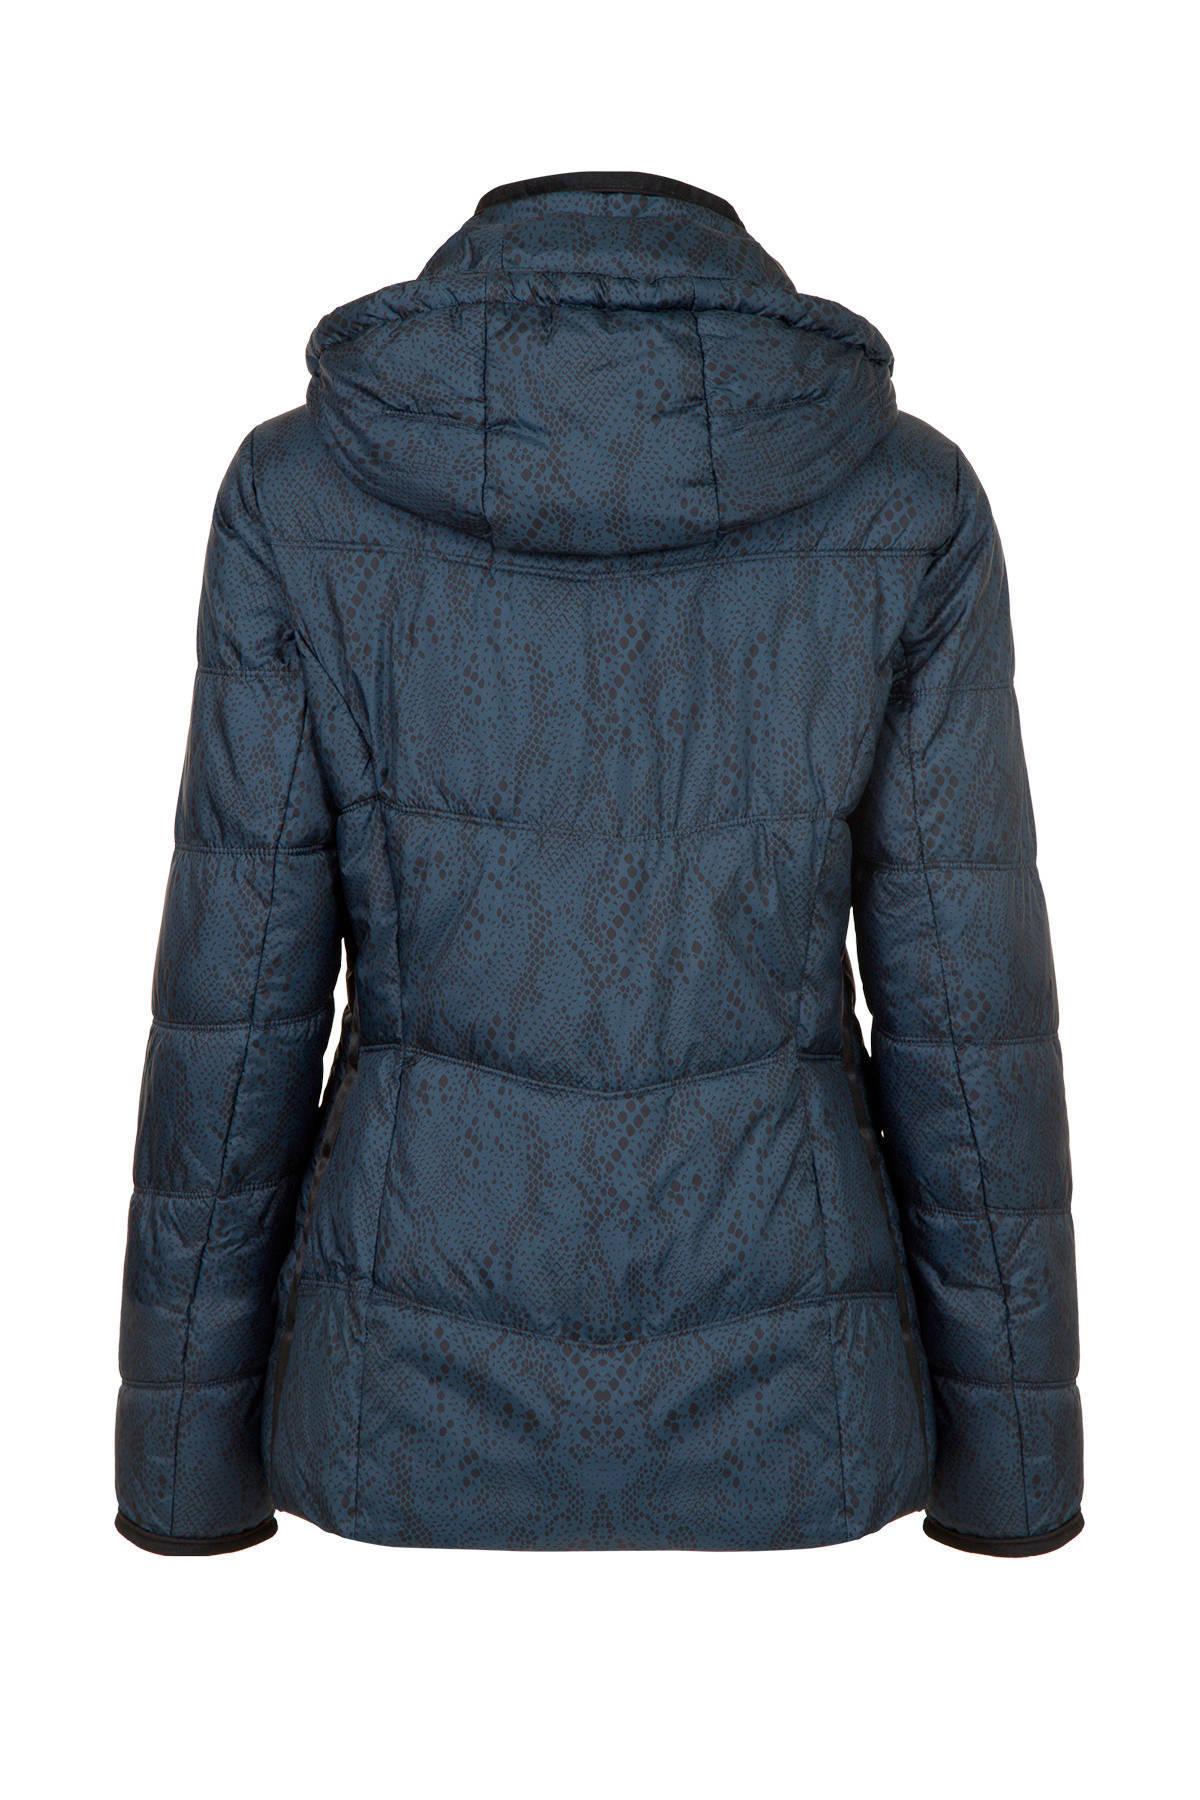 gewatteerde jas met contrastbies blauwzwart